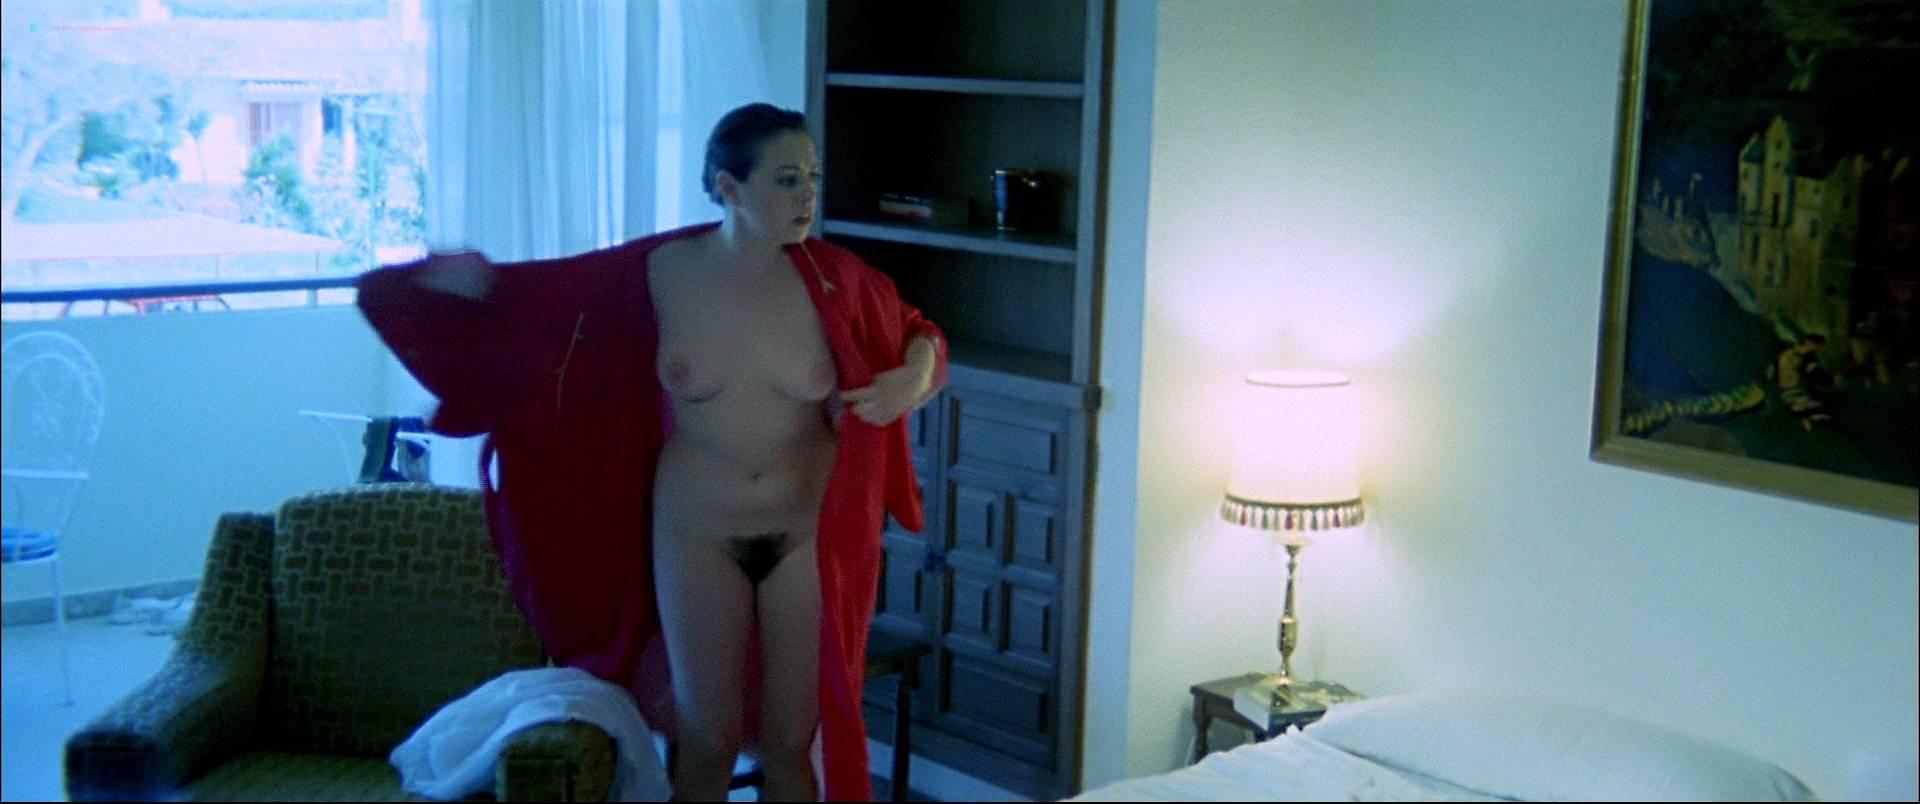 Lina Romay nude full frontal Mari Carmen Nieto, Alicia Príncipe nude too - Night of 1,000 Sexes (SP-1984) HD 1080p BluRay (9)